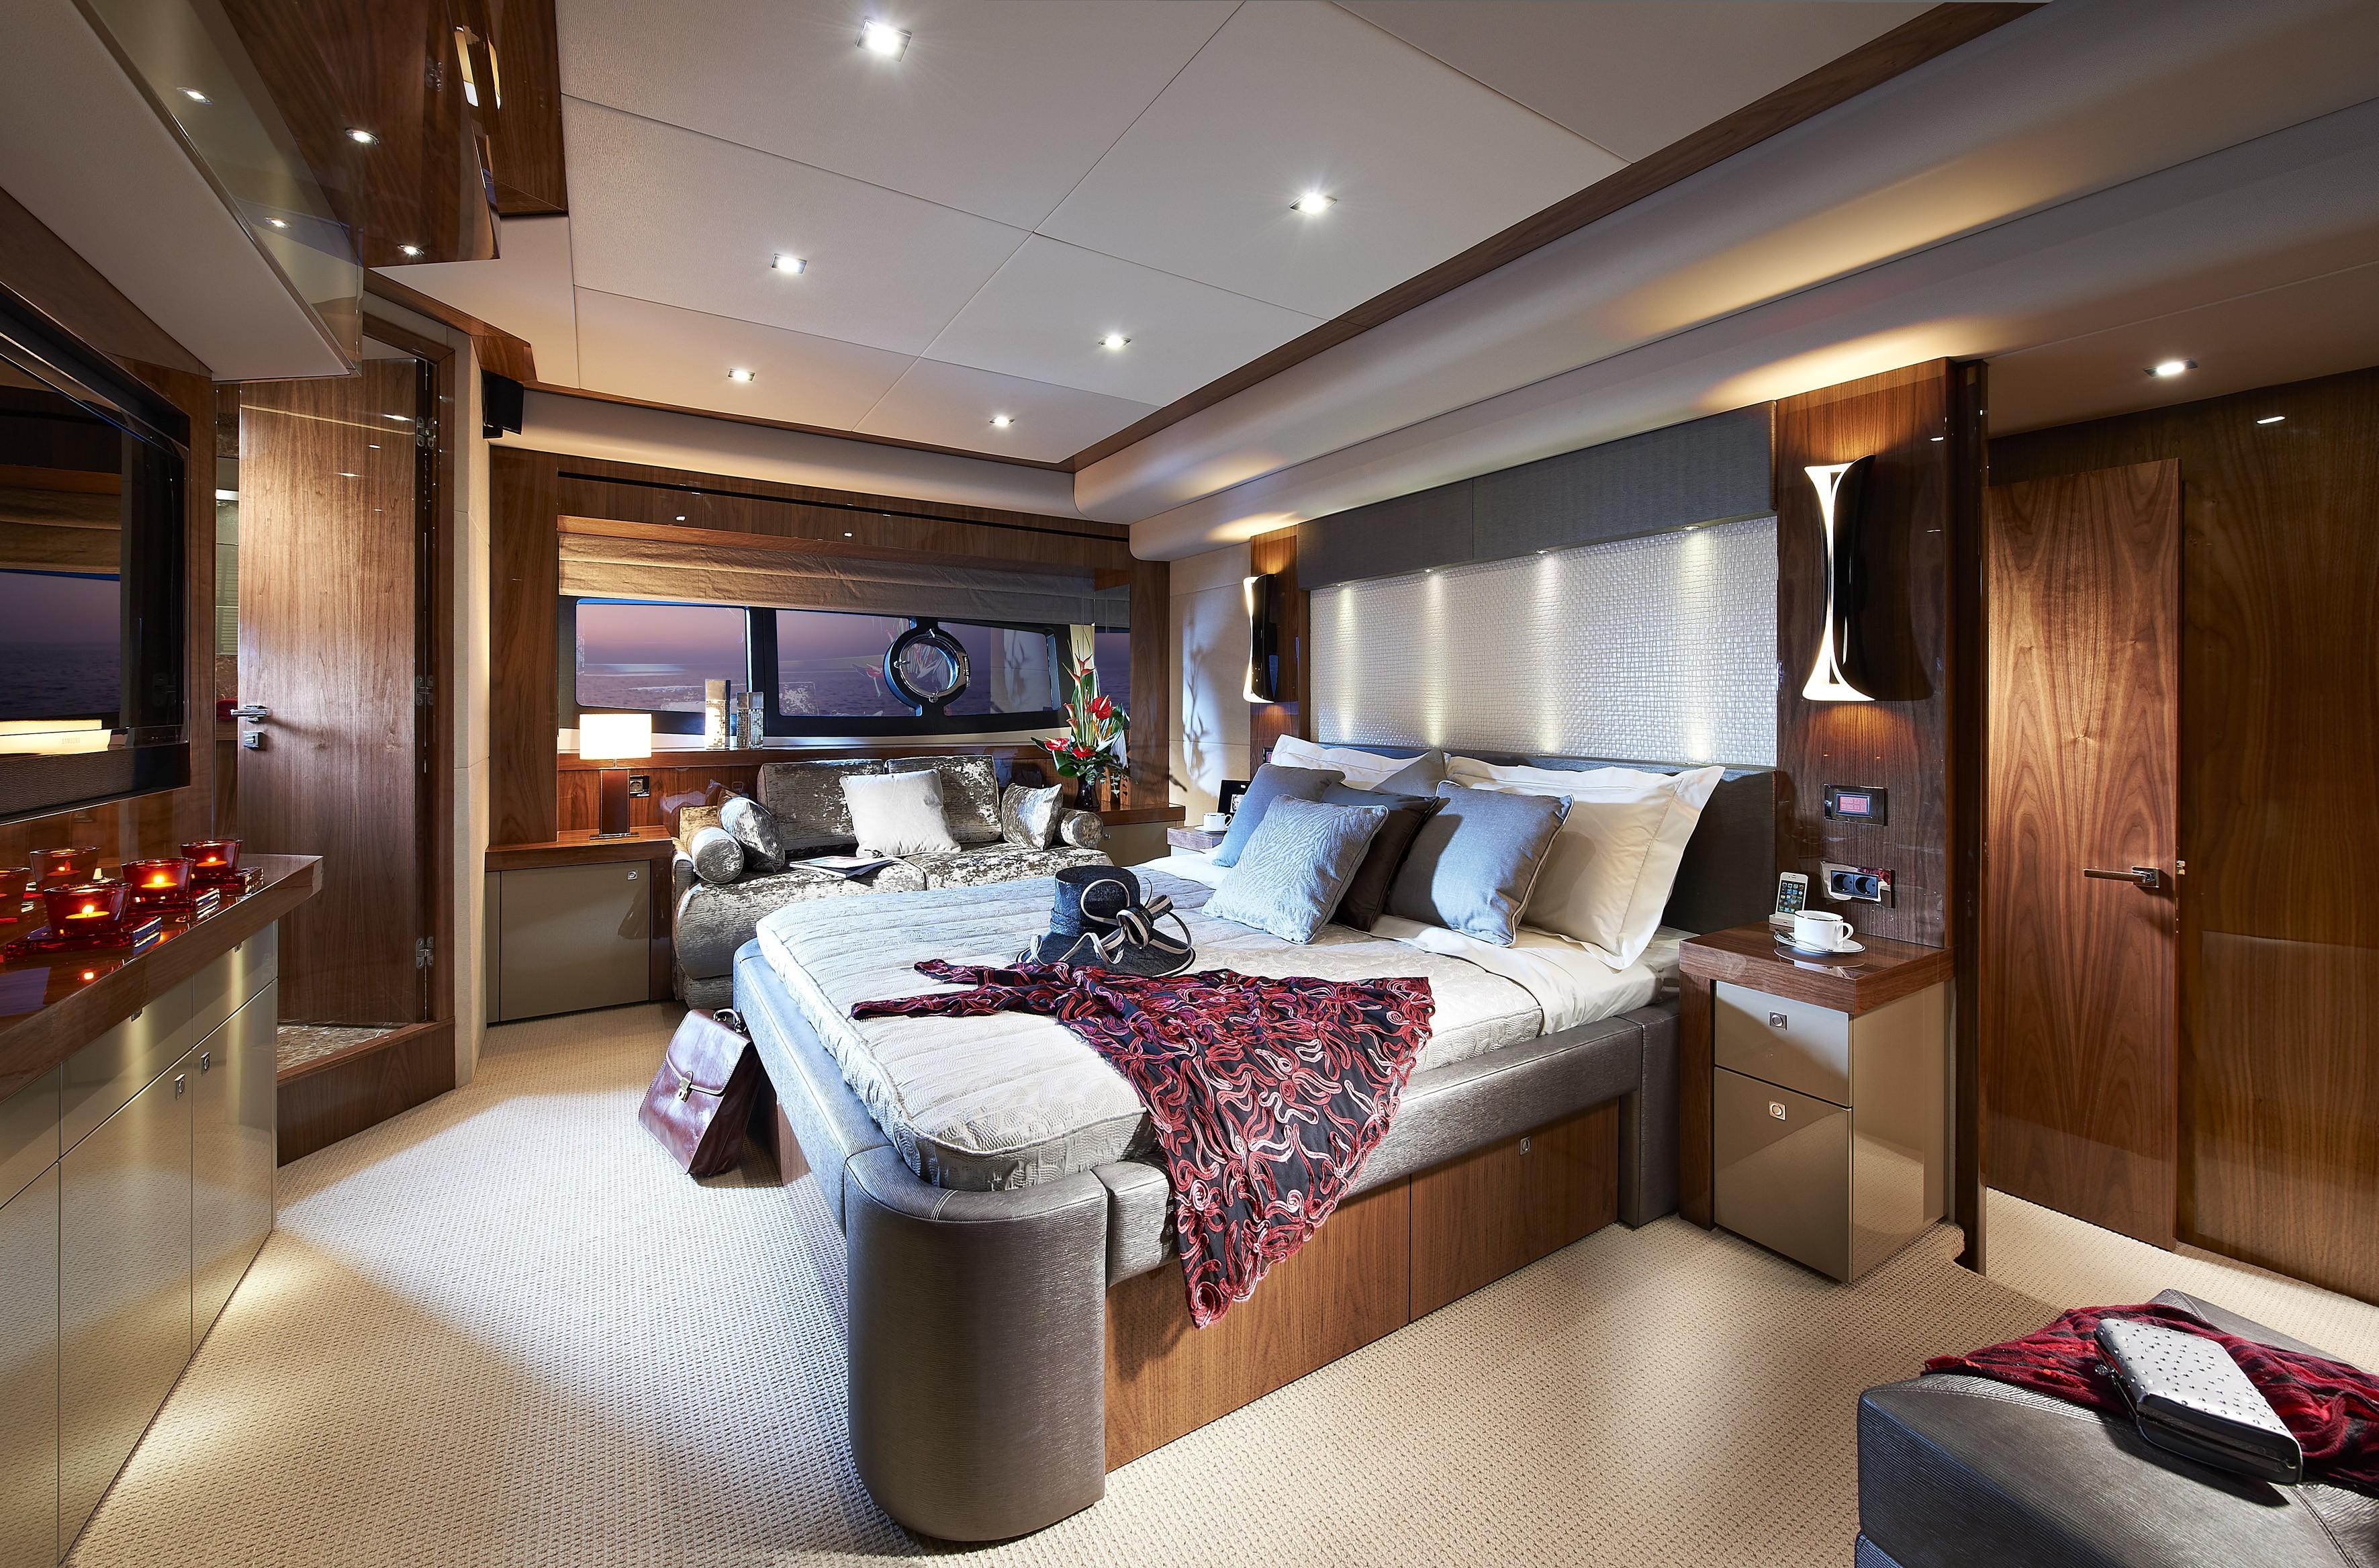 The 28m Yacht AQUA LIBRA